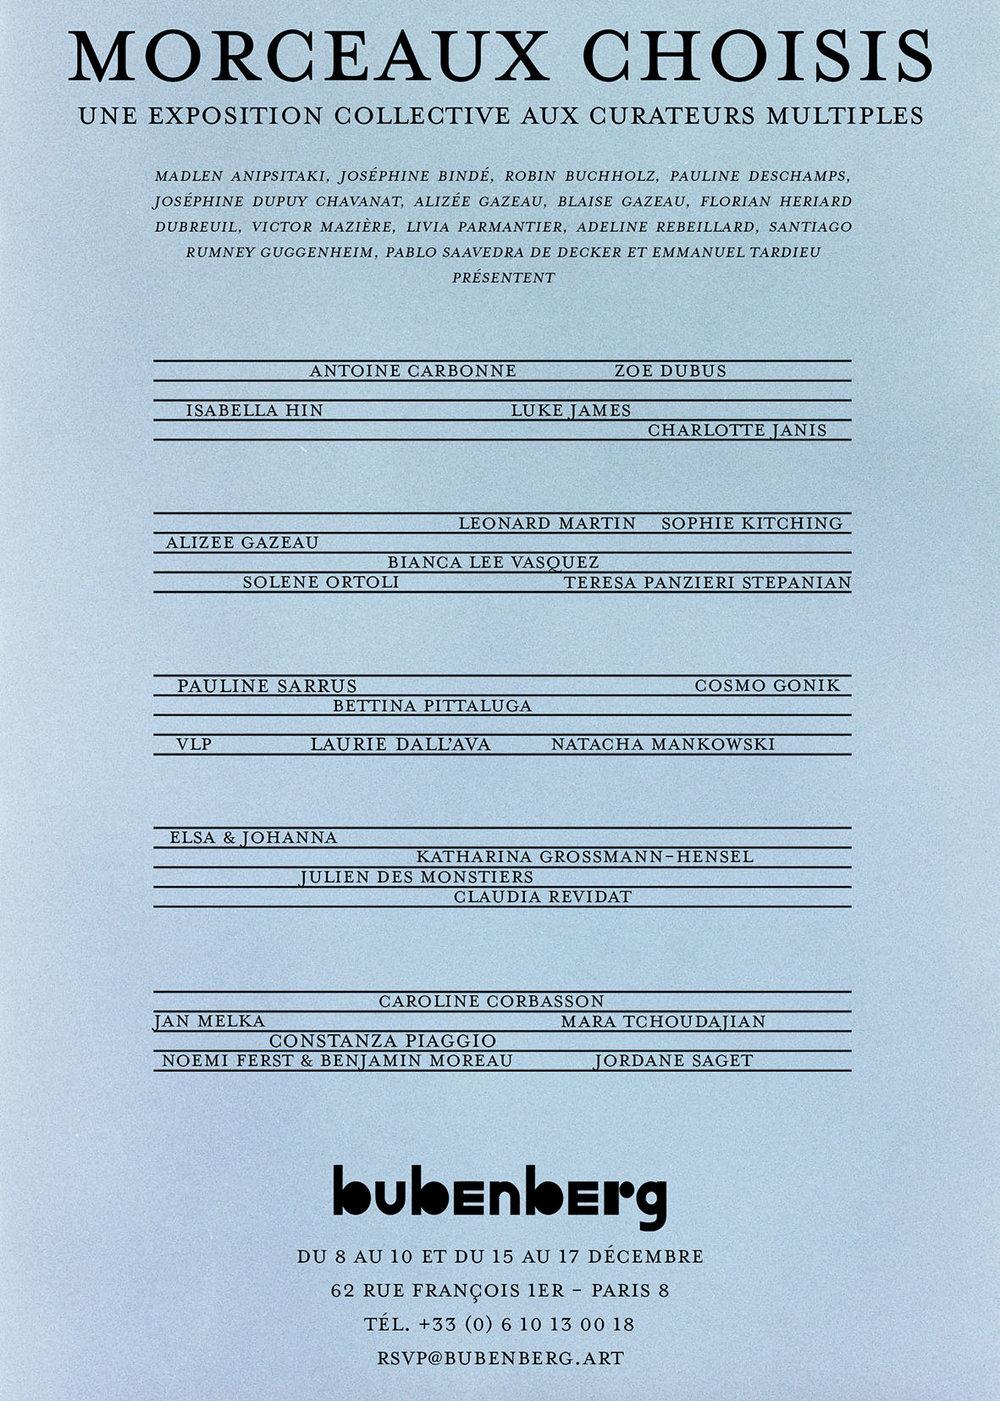 Morceaux choisis - Bubenberg -web.jpg